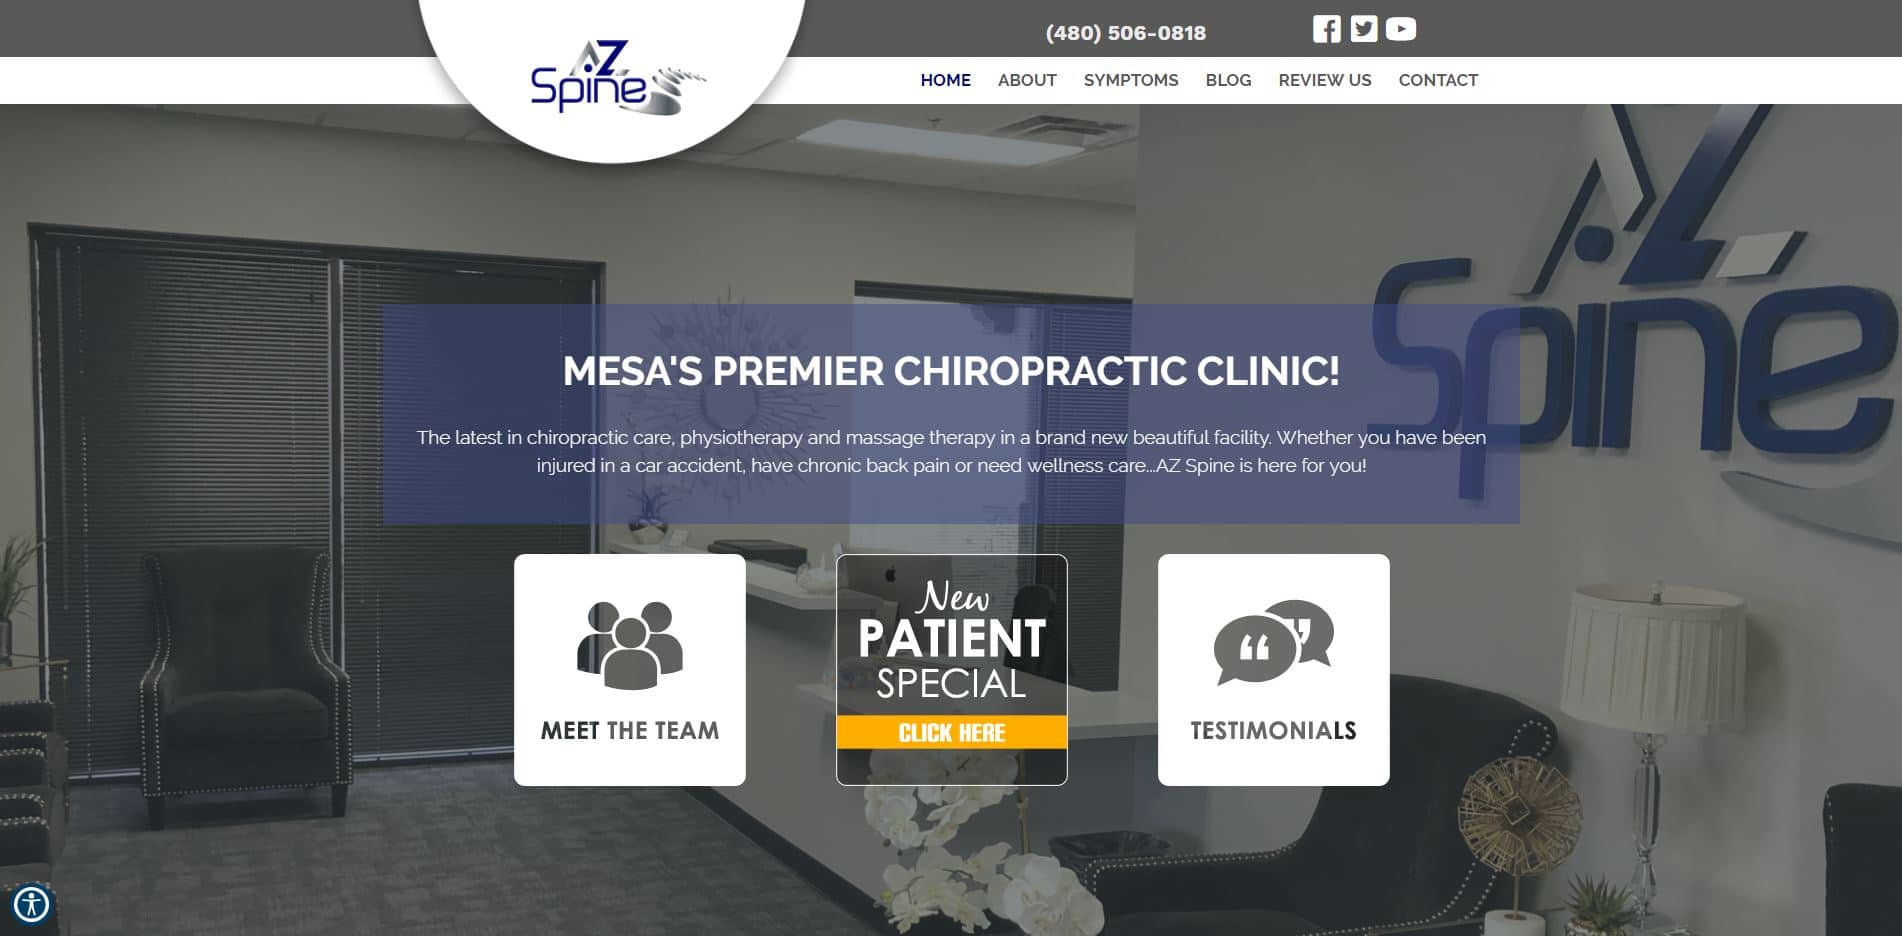 Chiropractor in Mesa